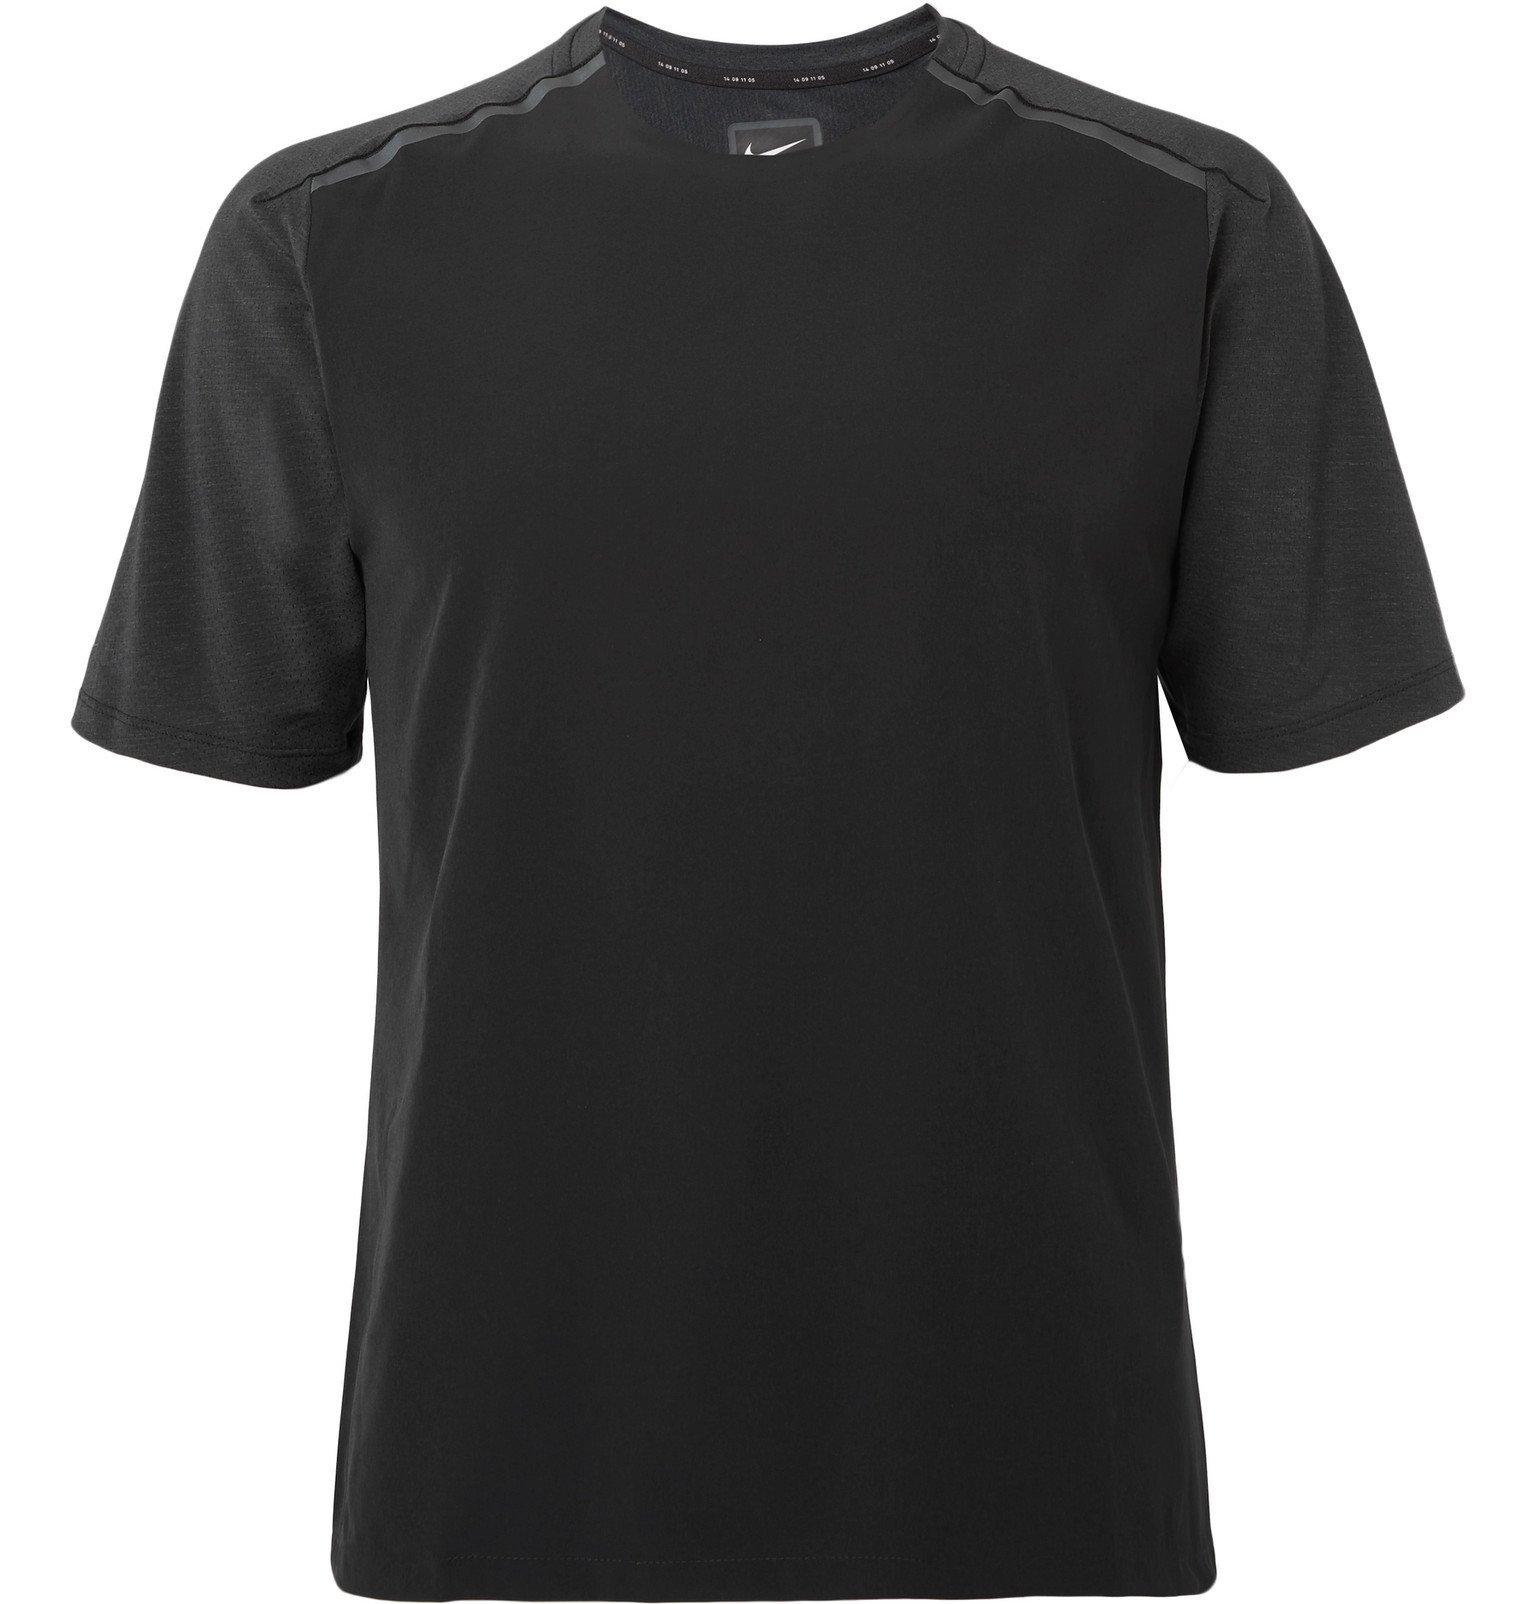 Nike Running - Tech Pack Running T-Shirt - Black